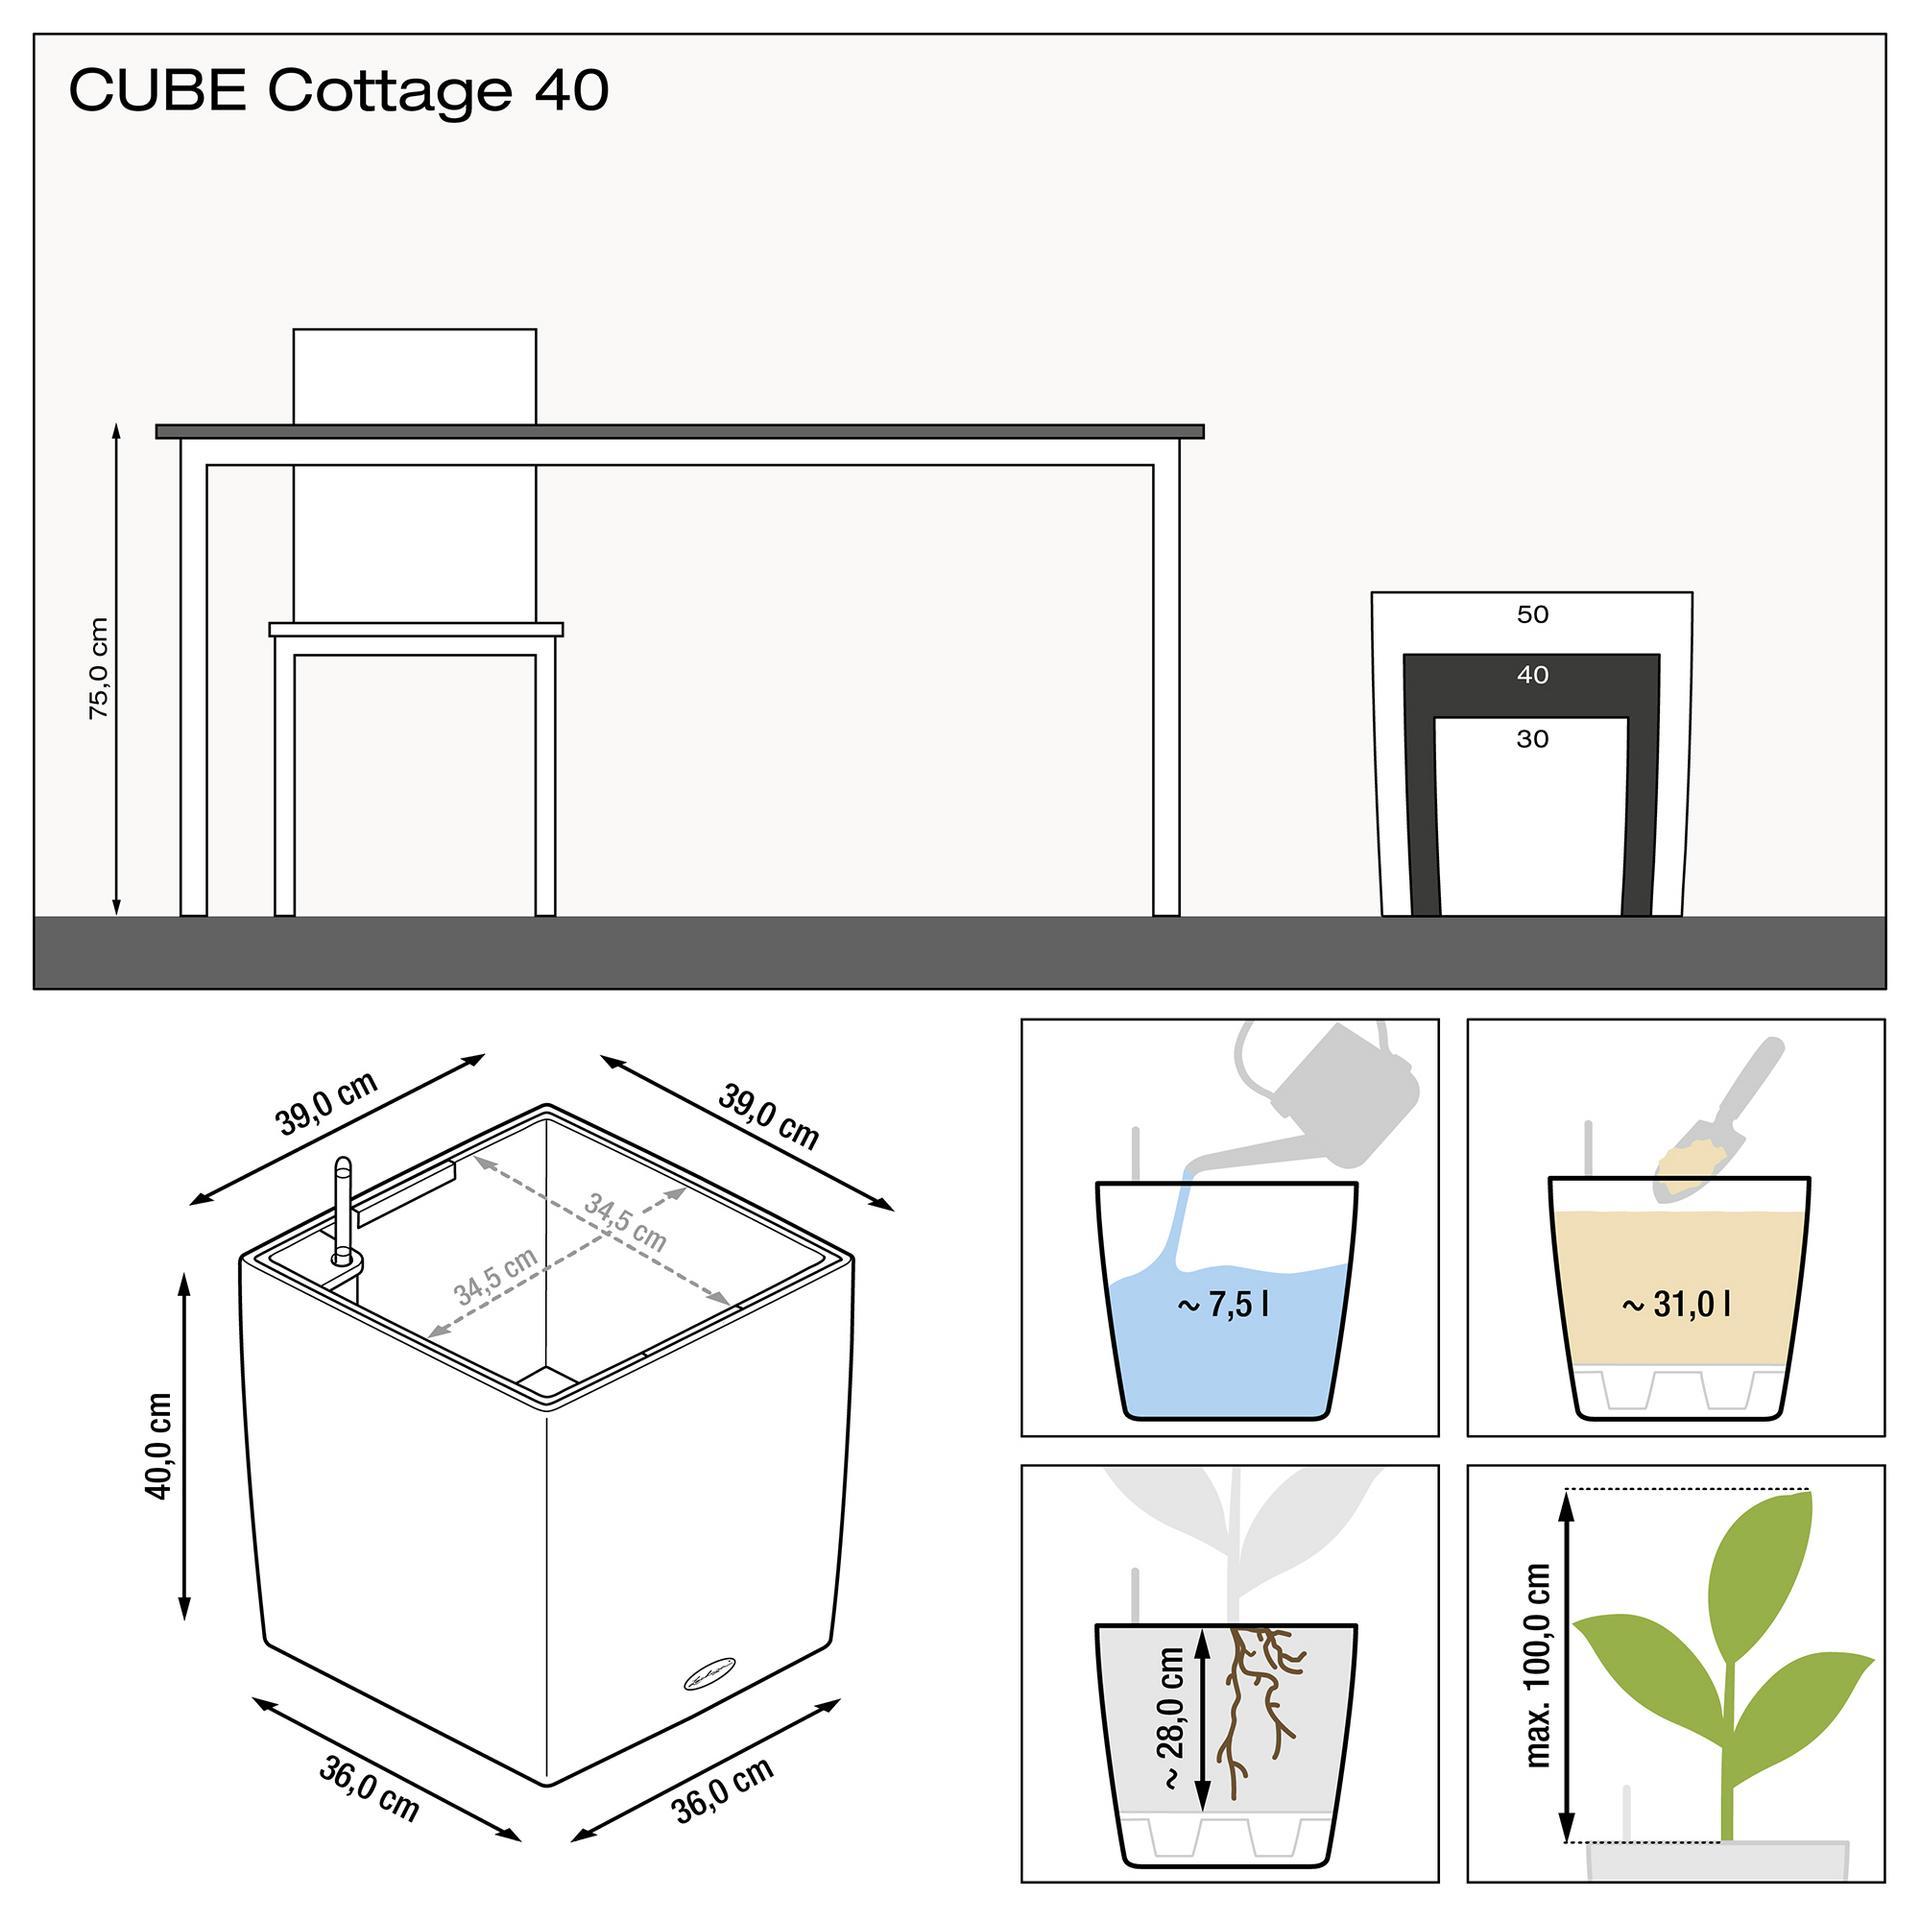 le_cube-cottage40_product_addi_nz